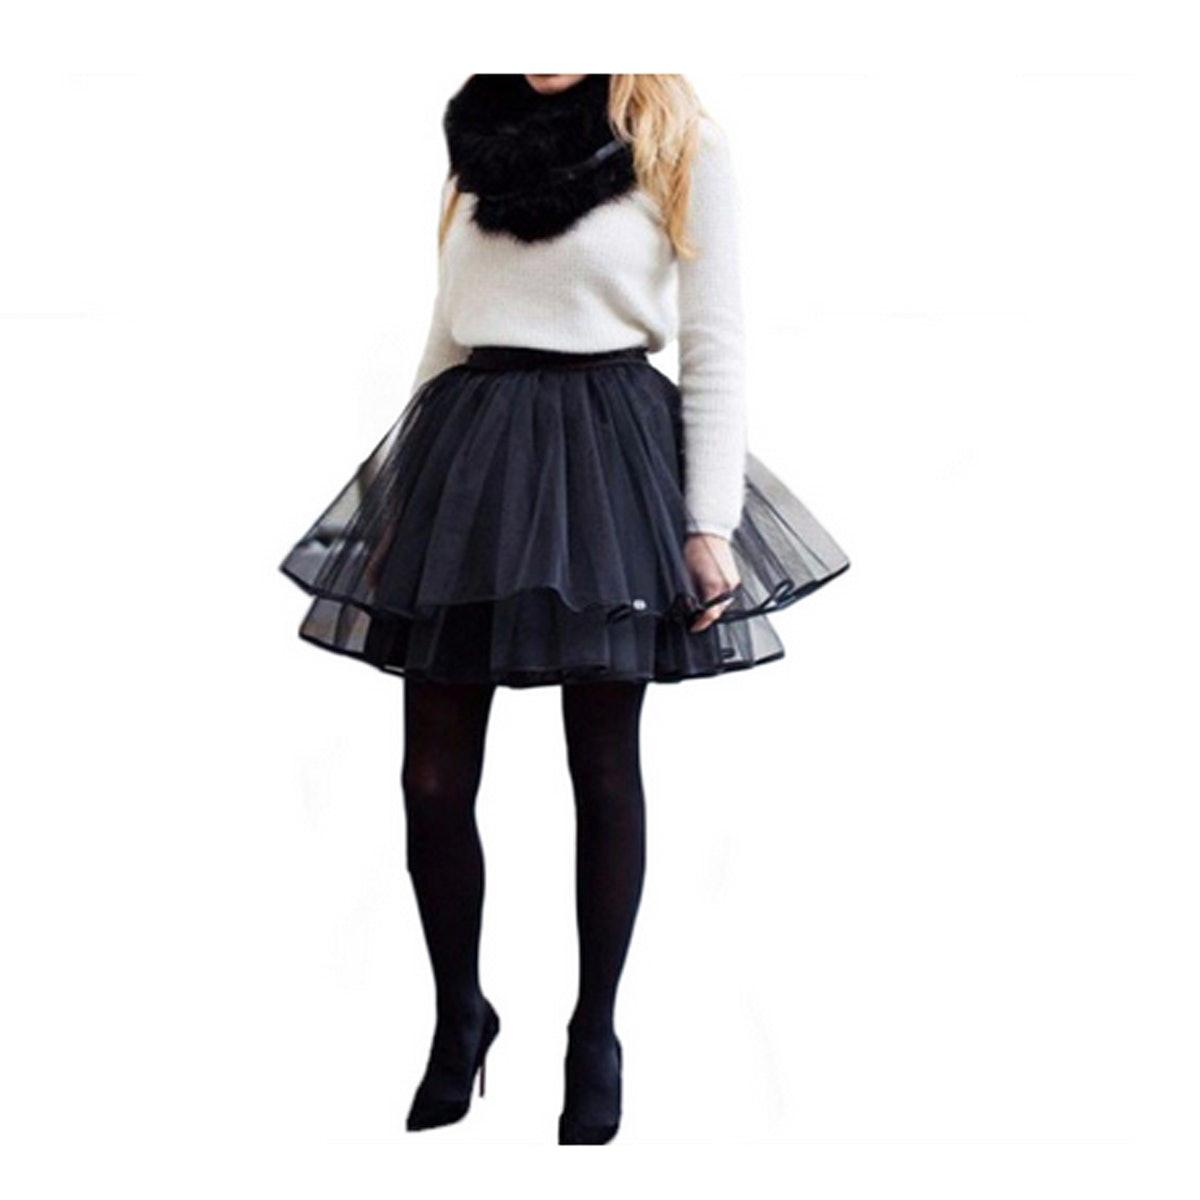 Bagilaanoe Women Tutu Tulle A line Skirt Short Prom Party above Knee Length Petticoat Dress